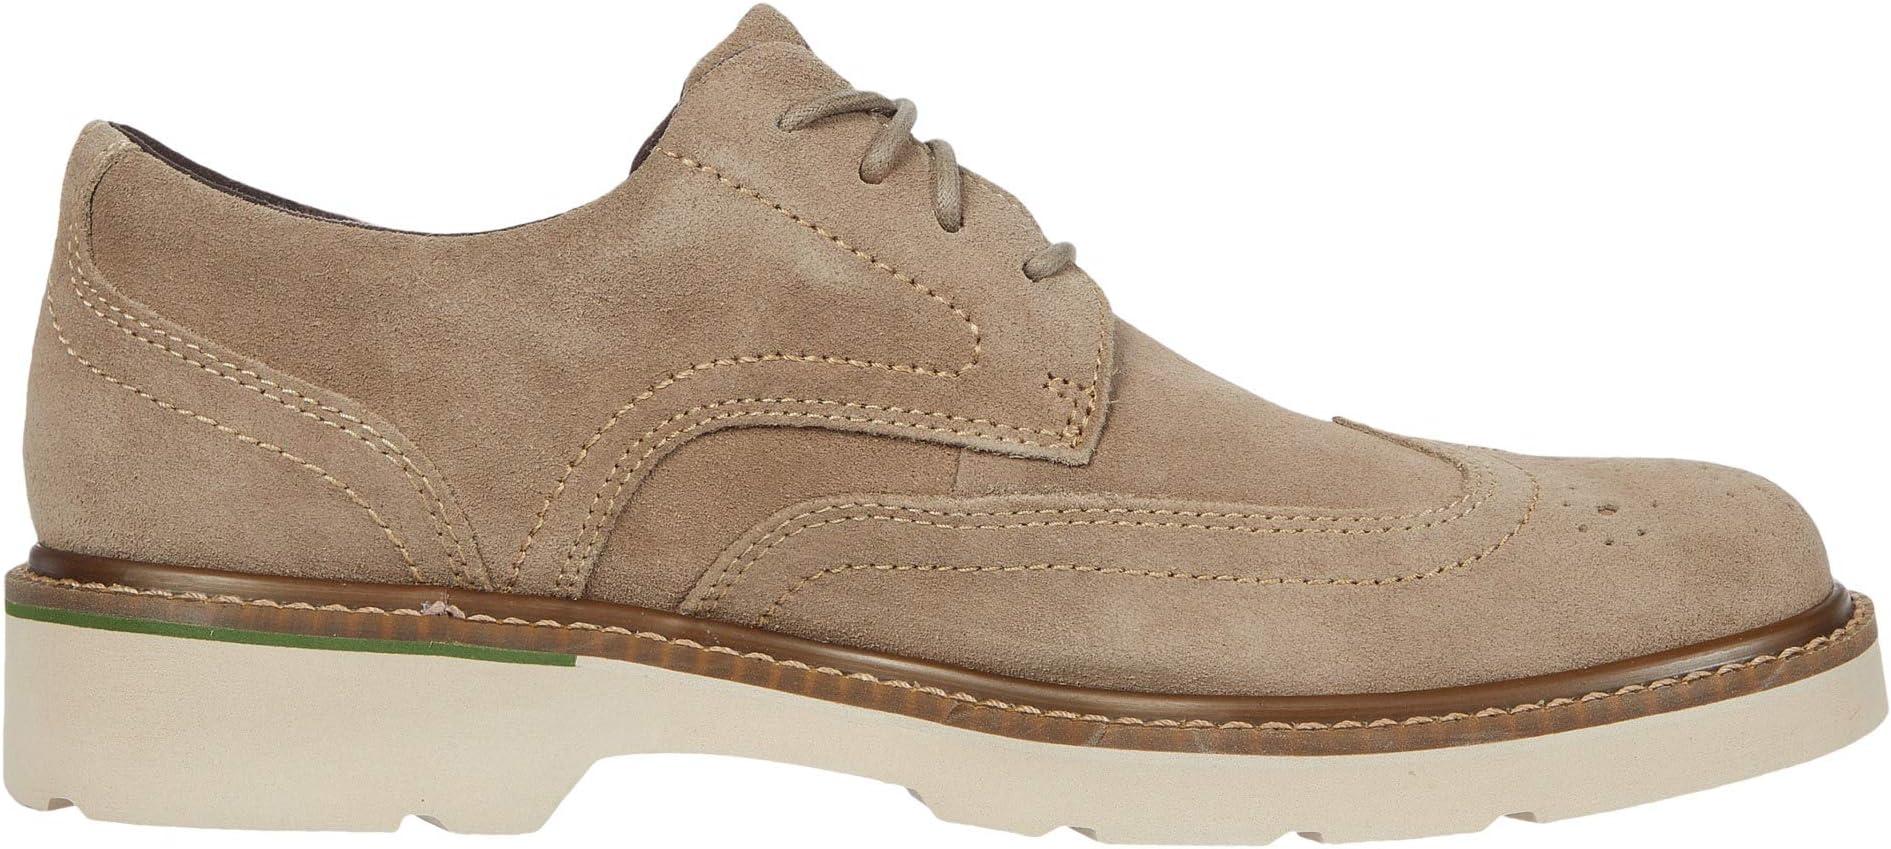 Rockport Charlee Wing Tip | Men's shoes | 2020 Newest